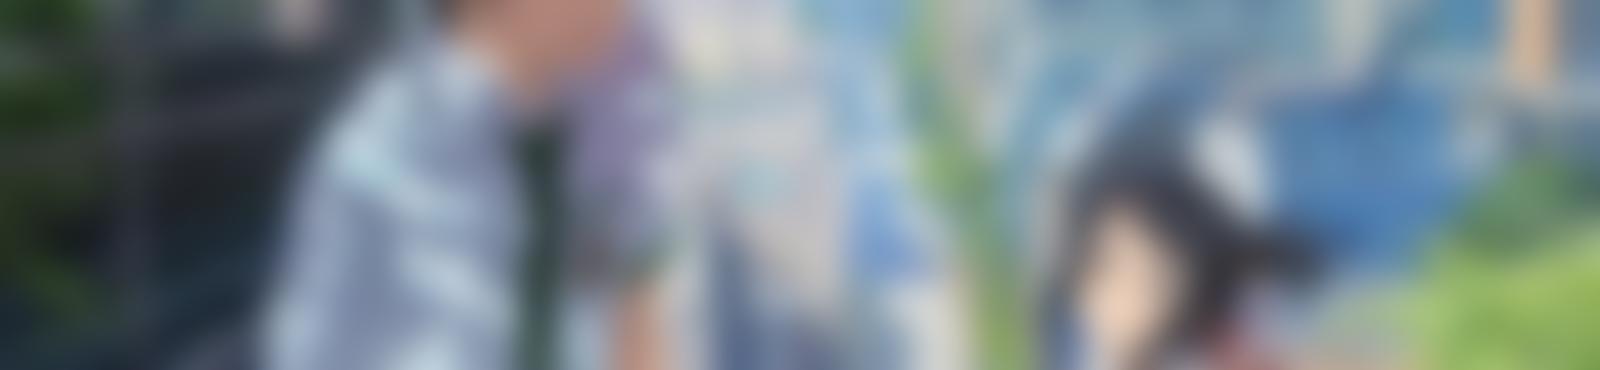 Blurred b11e2415 c9f6 4240 8ef5 74d8403fbb7d